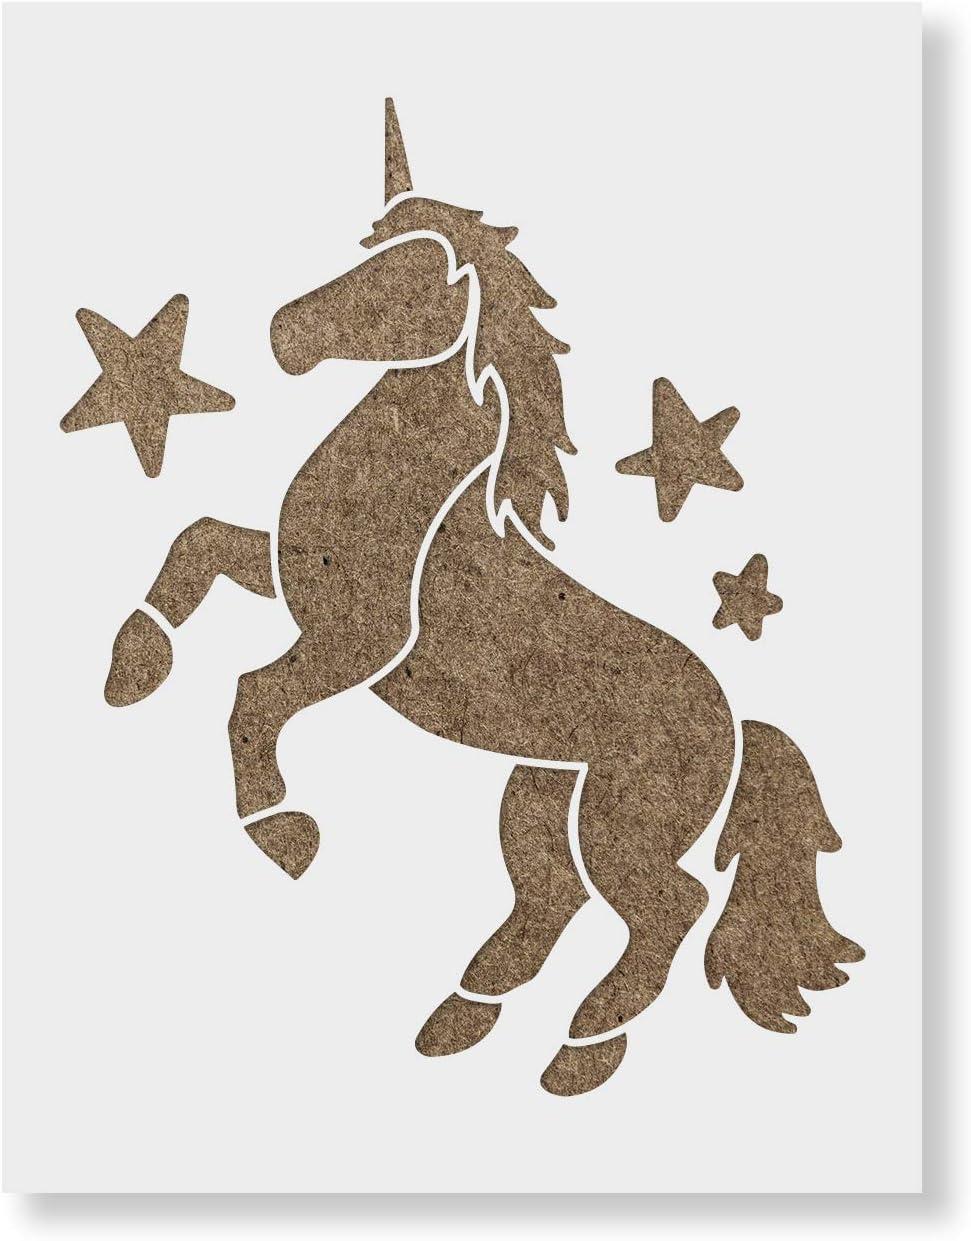 reusable-unicorn-stencil-template